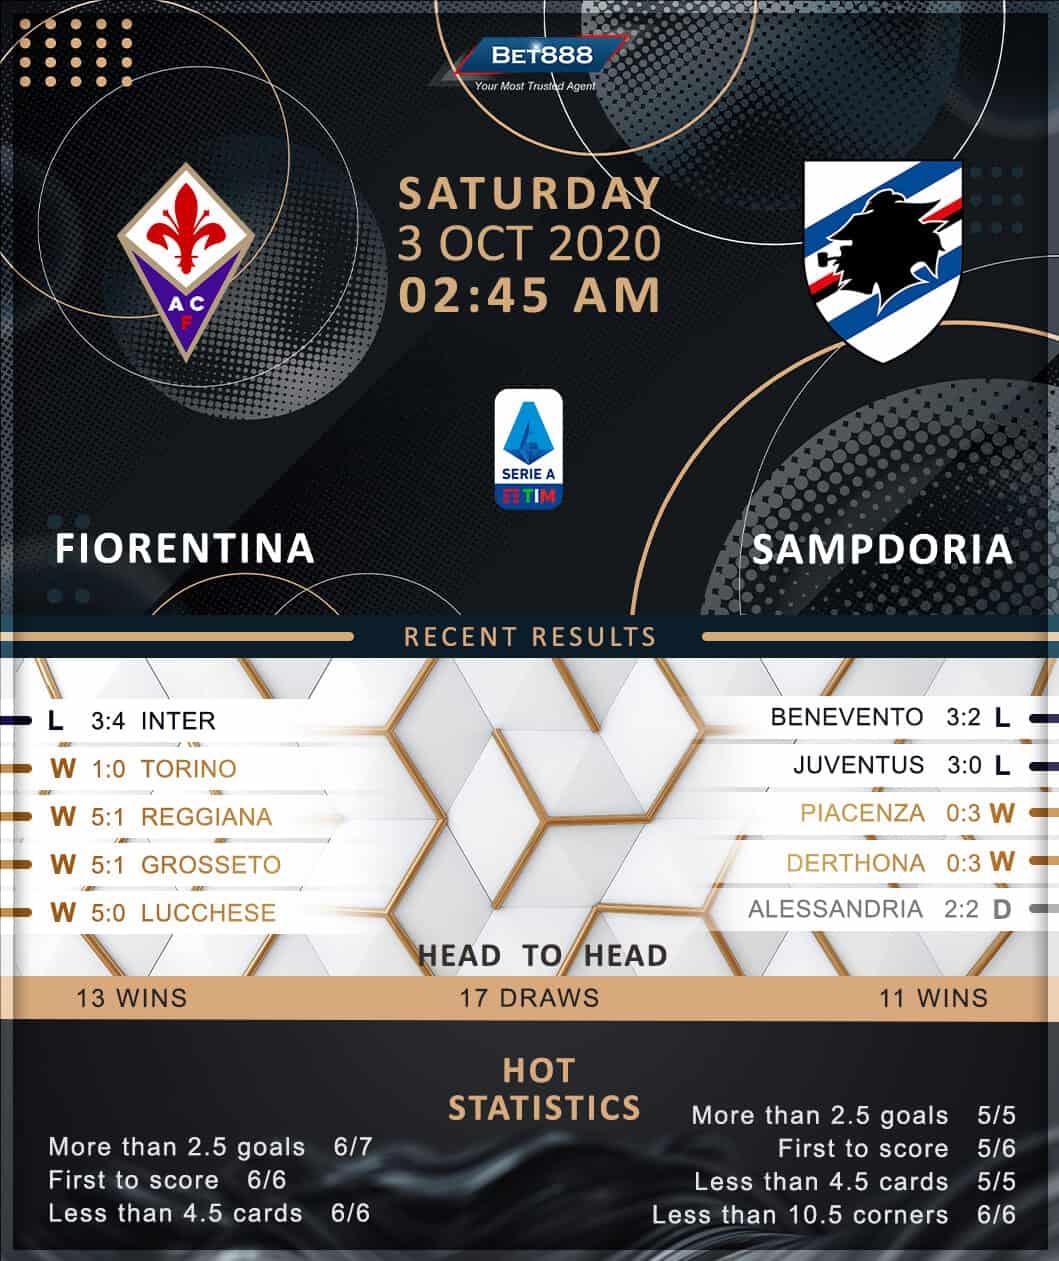 Fiorentina vs Sampdoria 03/10/20